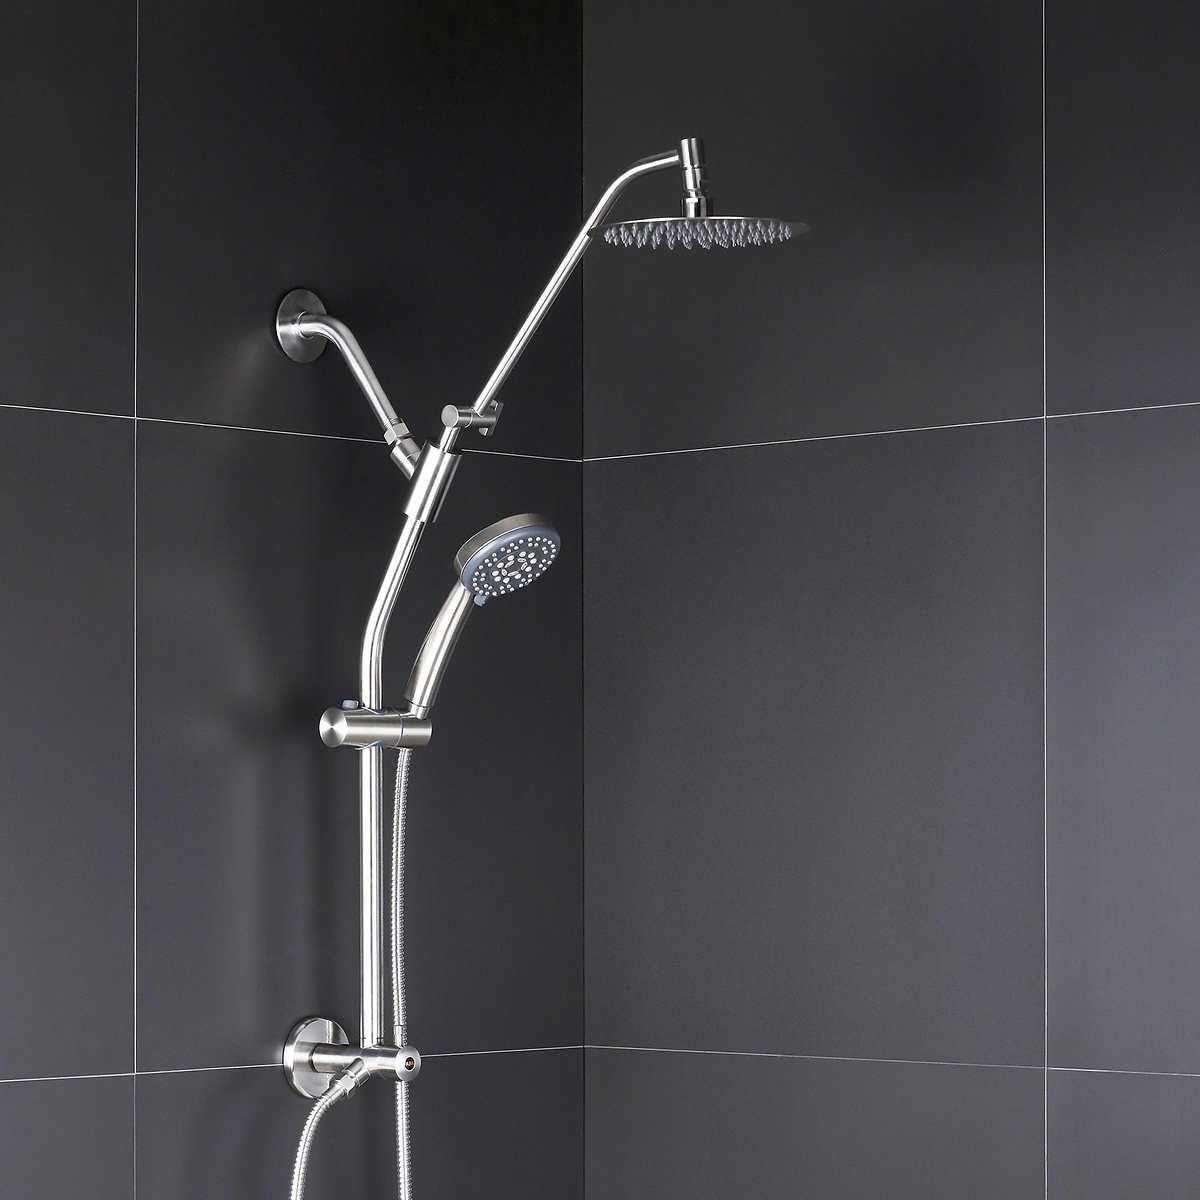 AFA Stainless Multi function Hand Held & Rain Head Shower System